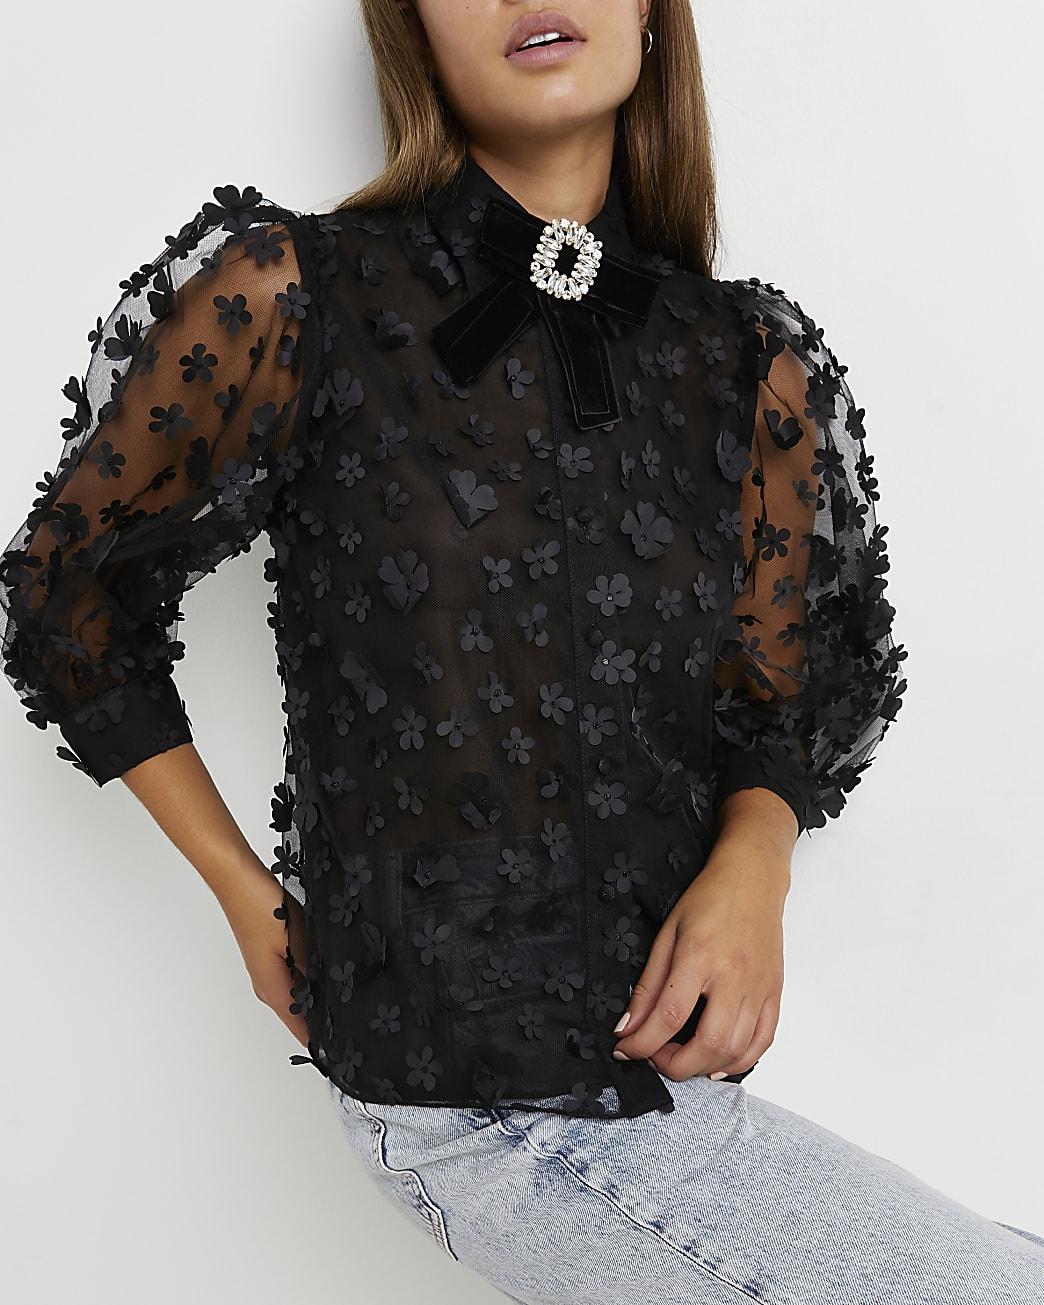 Black floral organza shirt